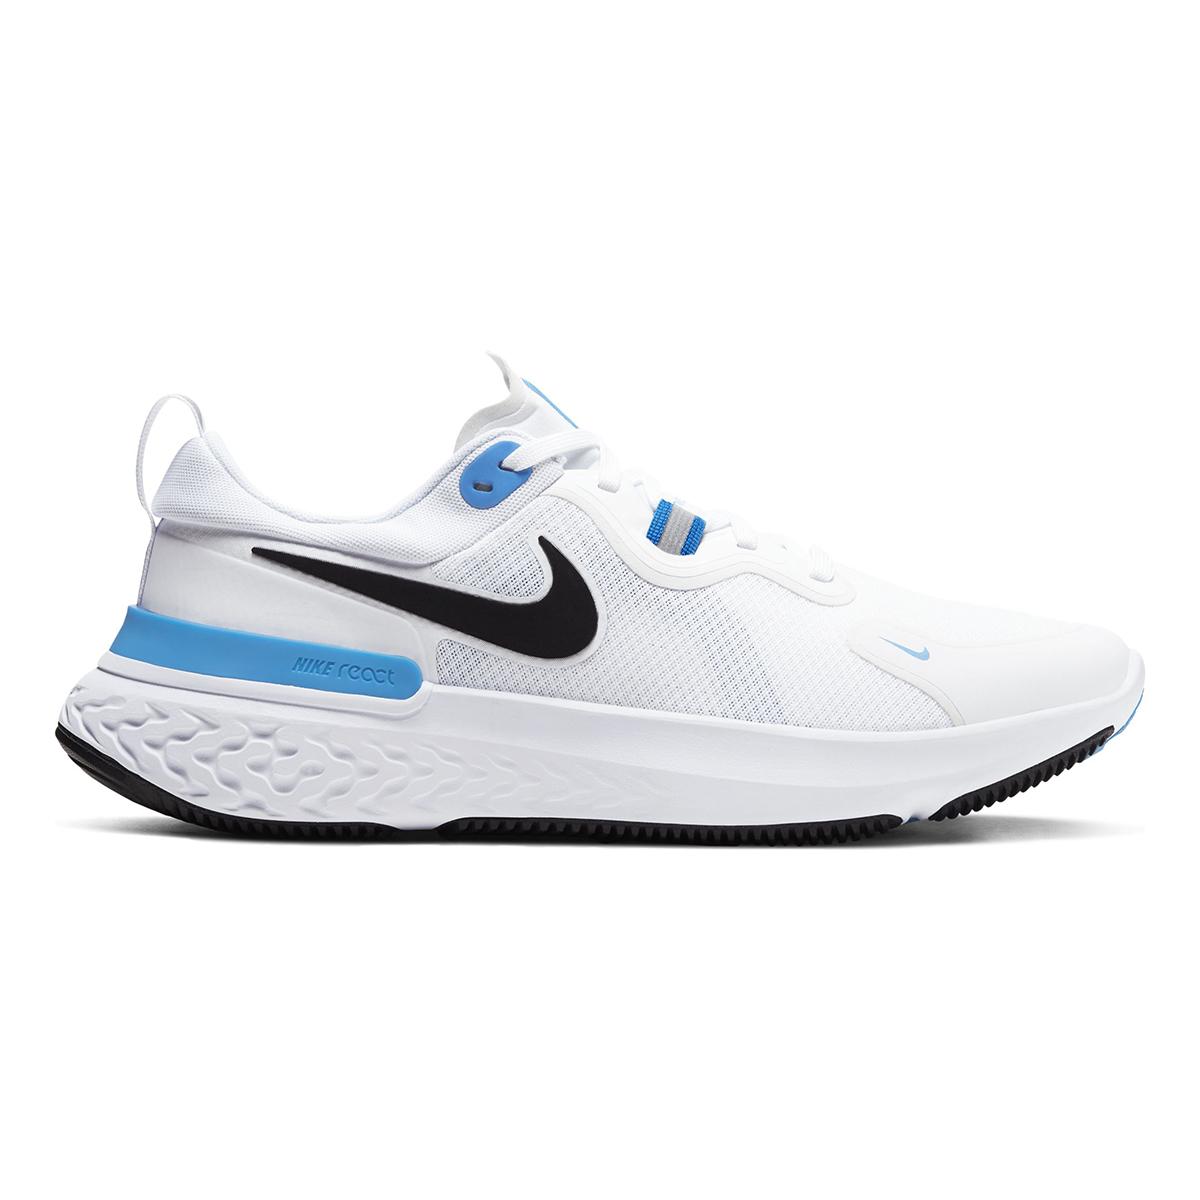 Nike React Miler Men's or Women's Running Shoes